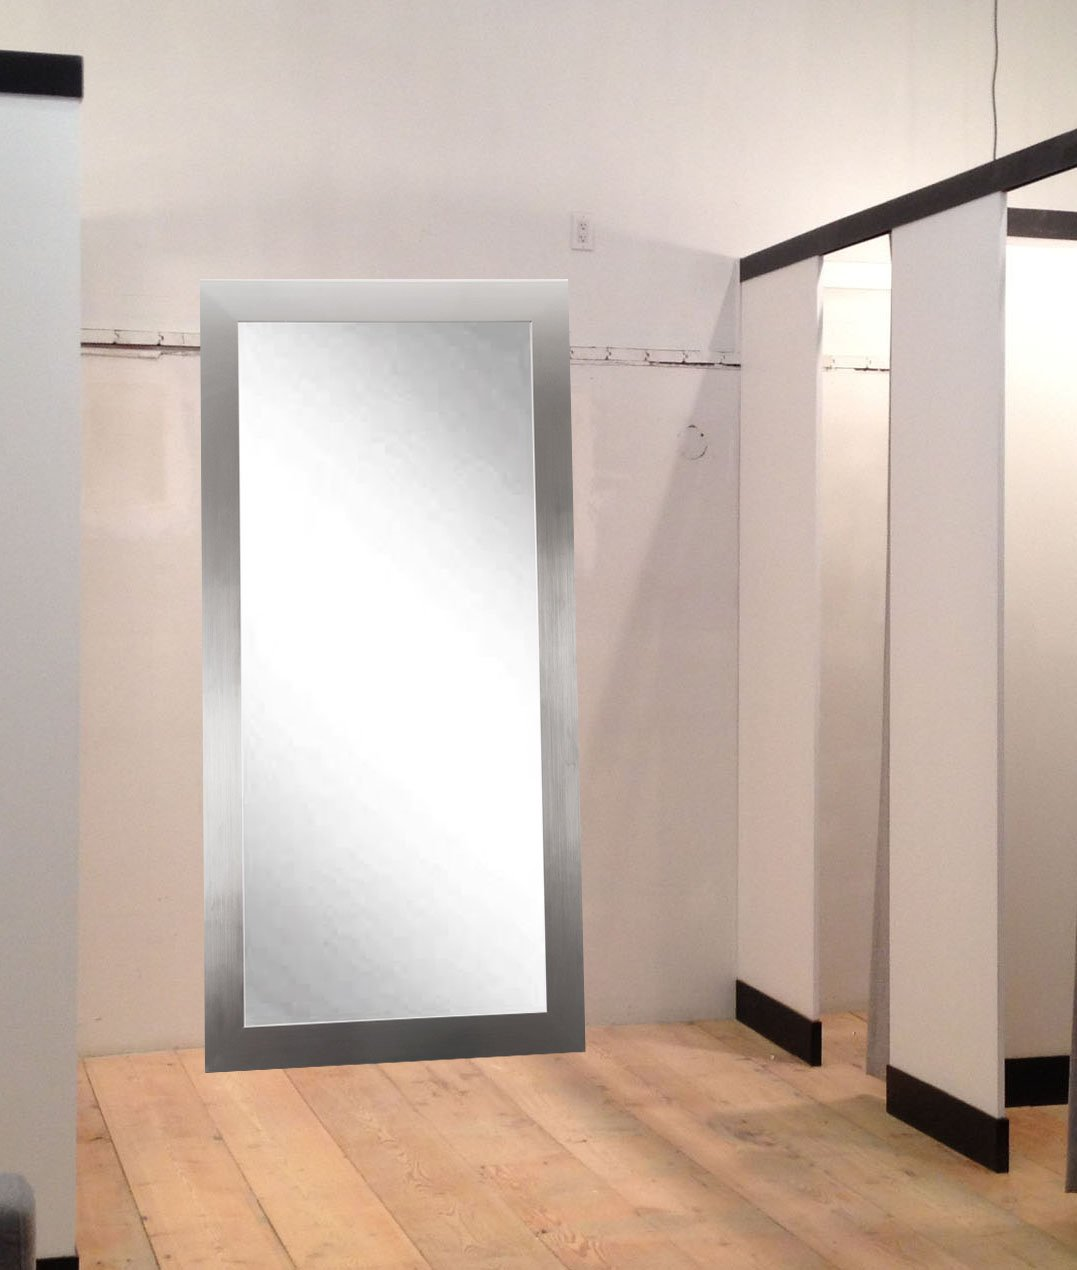 BrandtWorks Commercial Value Hotel Design Vanity Wall Mirror, 32'' x 66'', Silver